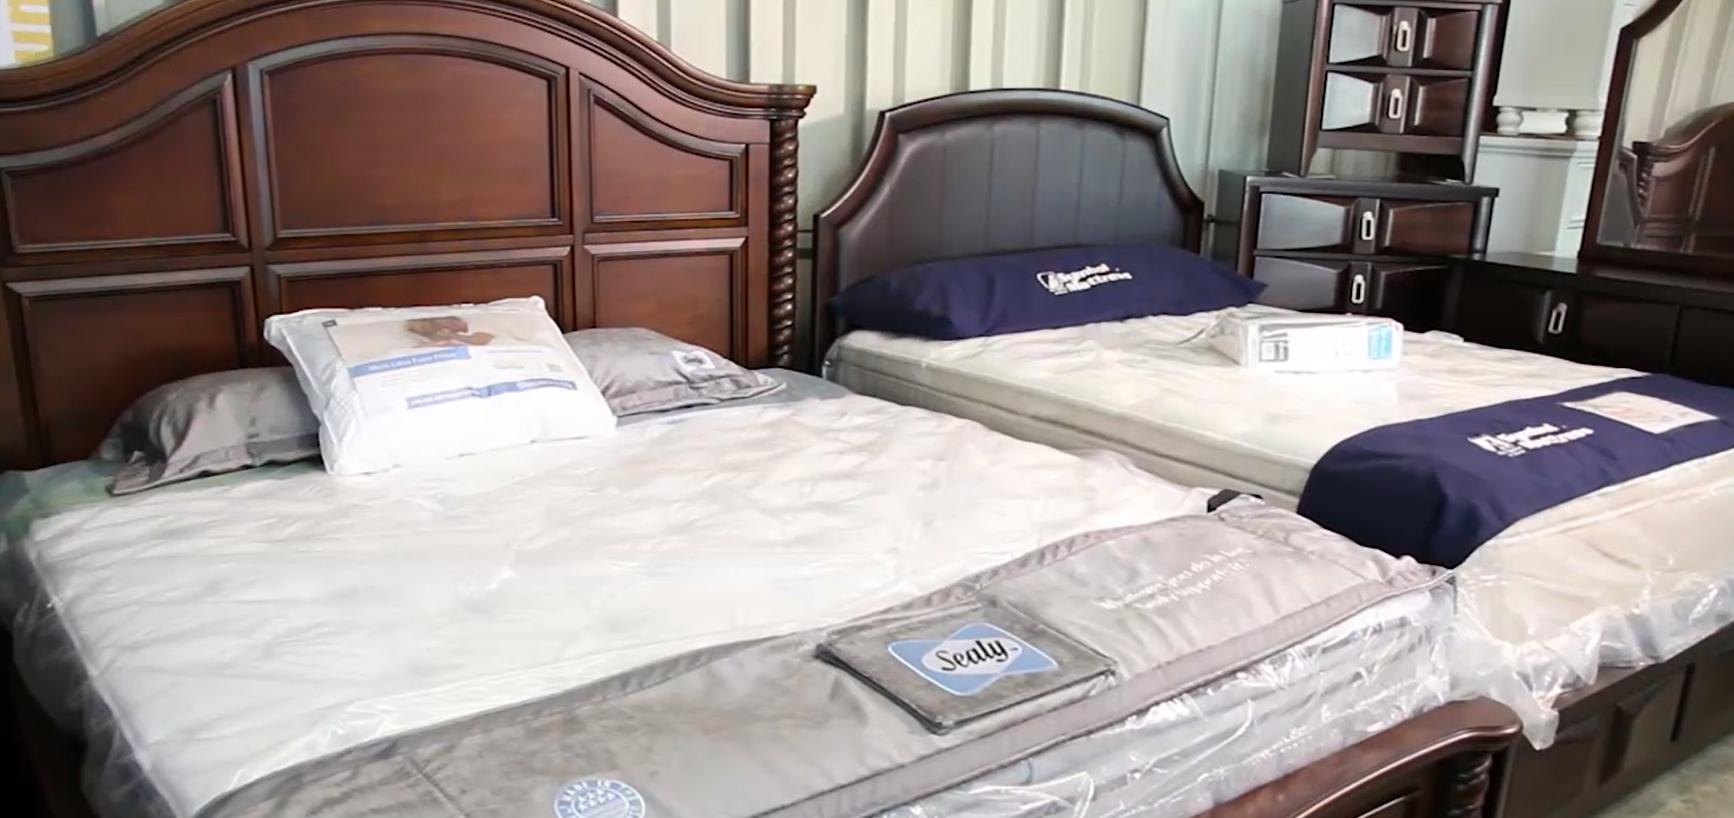 Best price furniture mattress in fleming island fl for Affordable furniture jacksonville fl